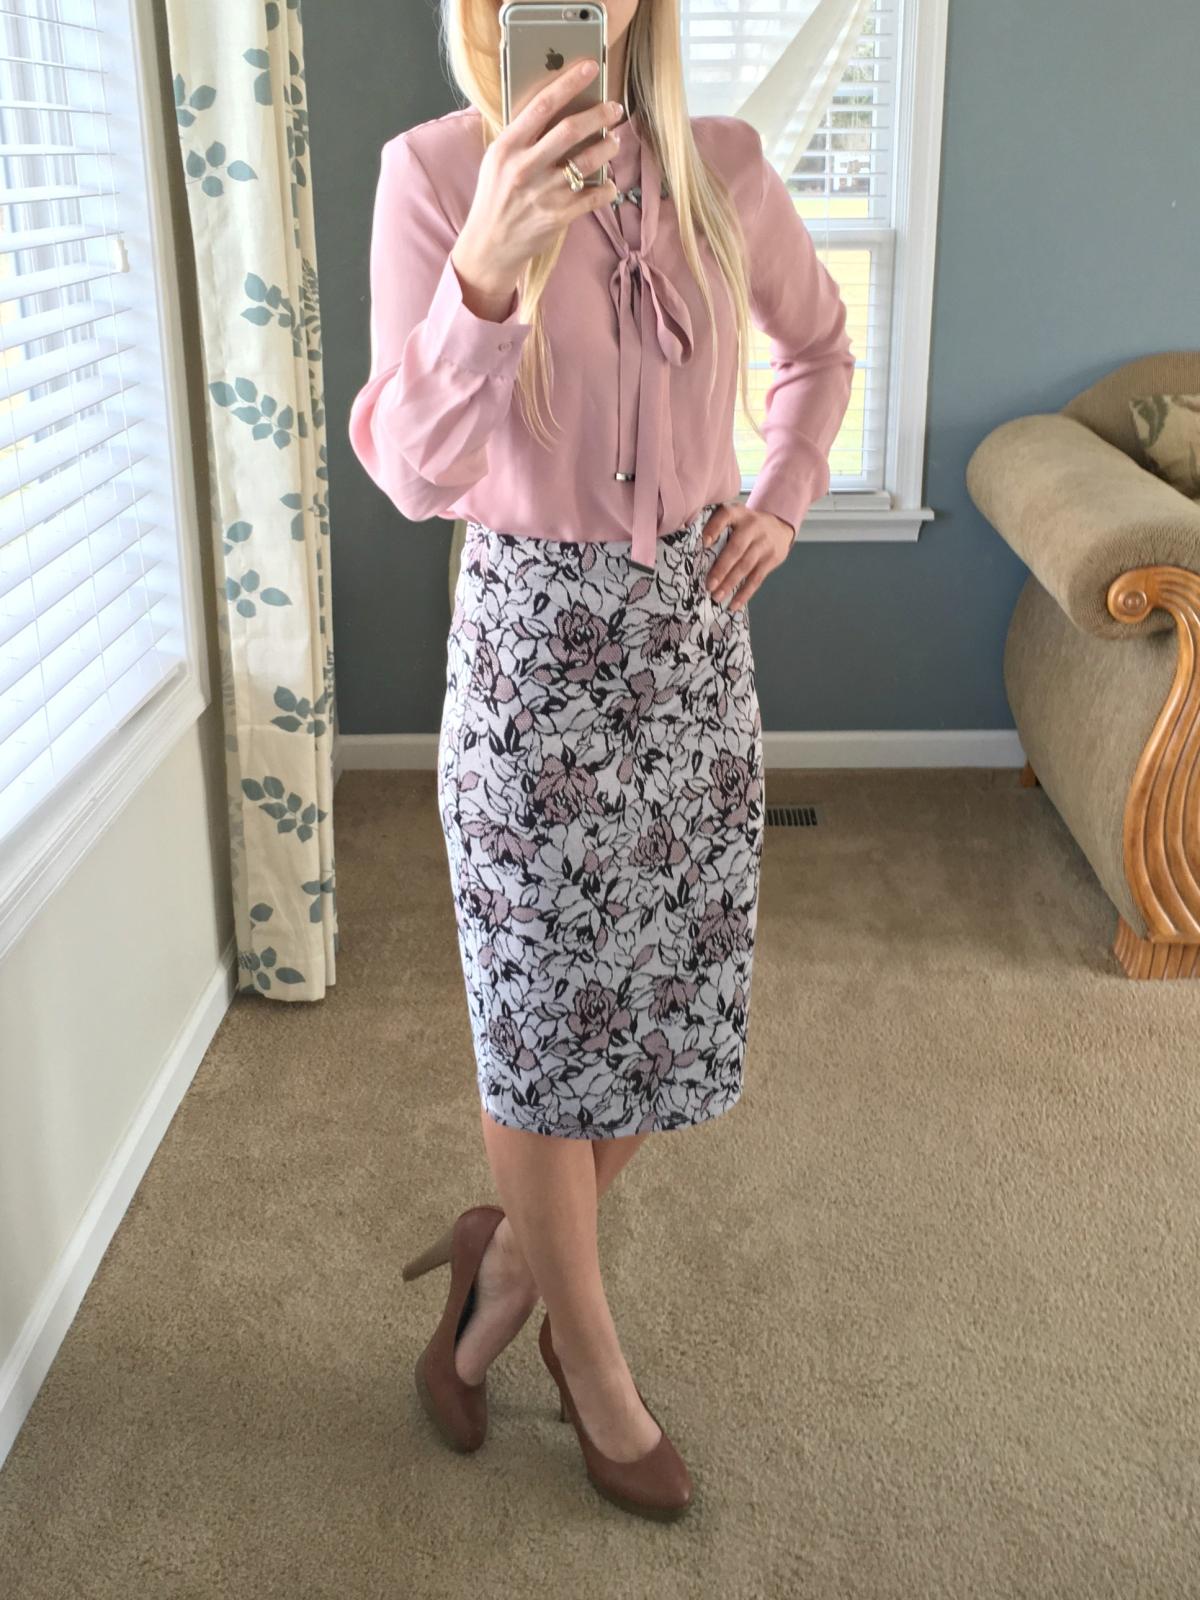 Papermoon Cheryl Printed Pencil Skirt: December 2015 Stitch Fix Review |www.pearlsandsportsbras.com|